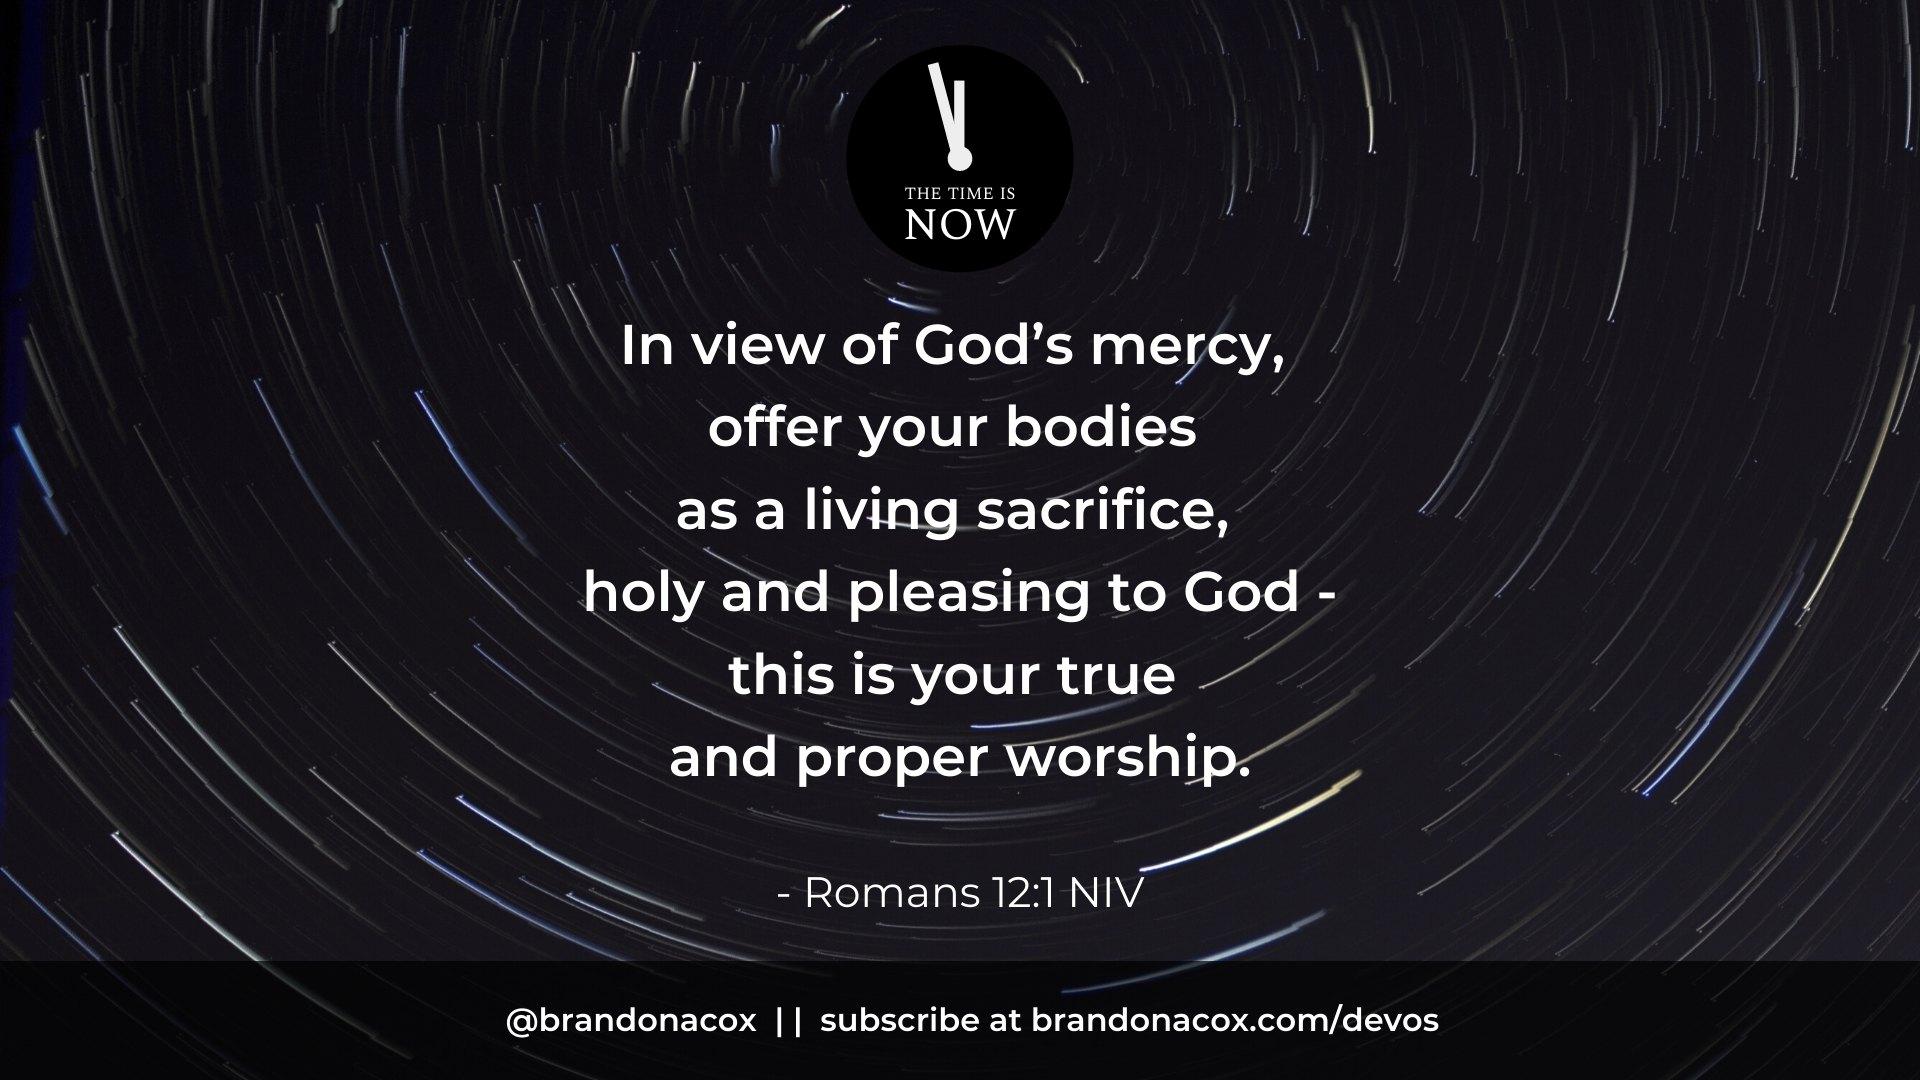 Be a Living Sacrifice